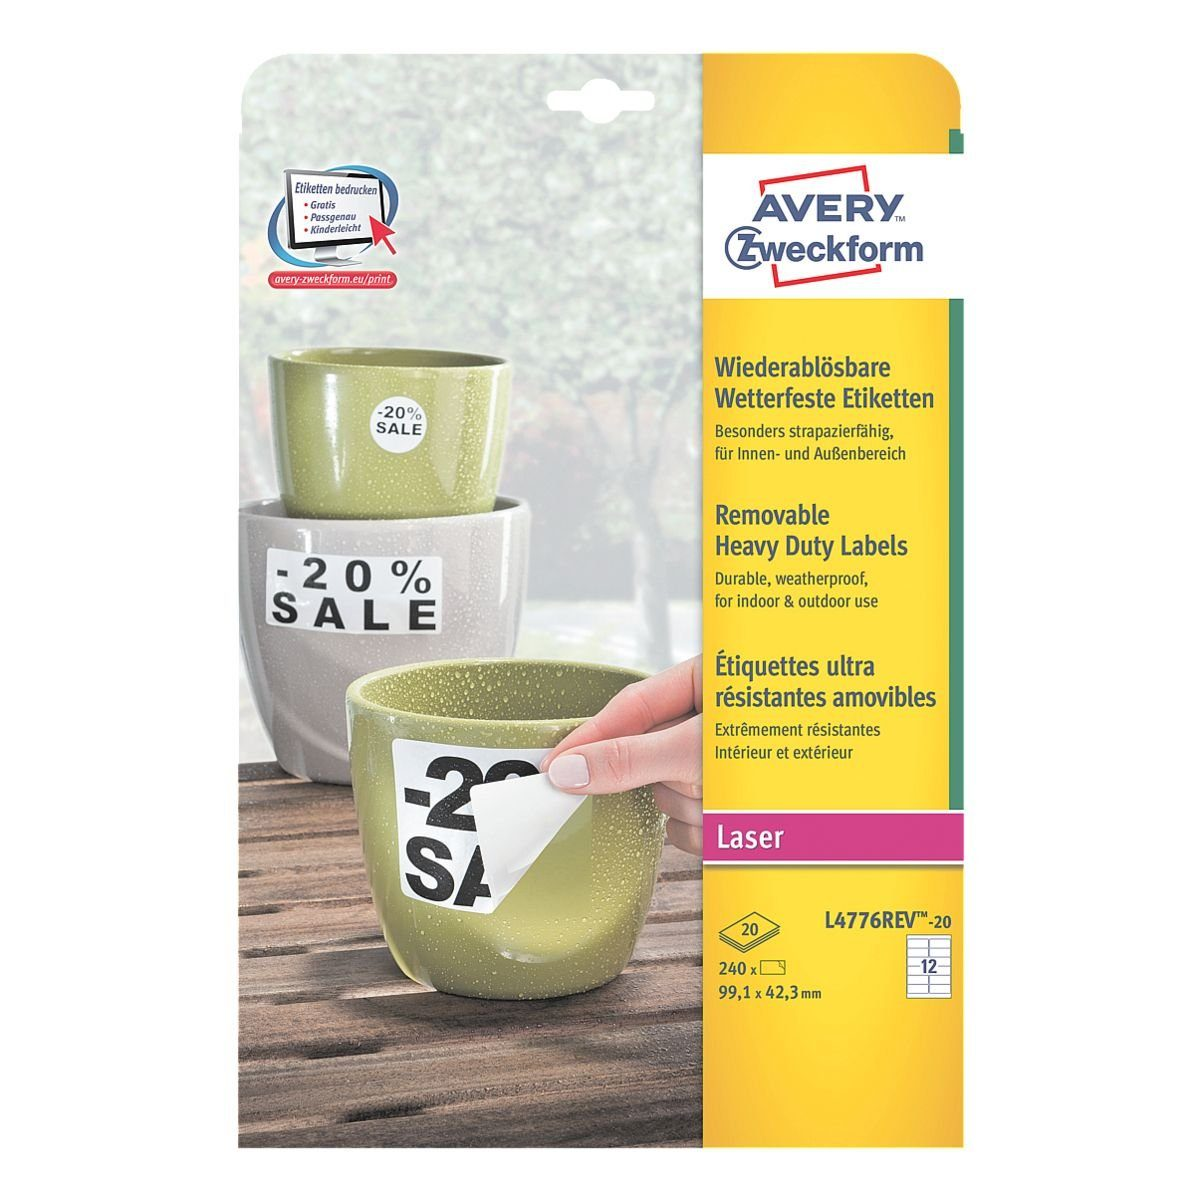 ZWECKFORMAVERY 240er-Pack Folien-Etiketten »L4776REV-20«